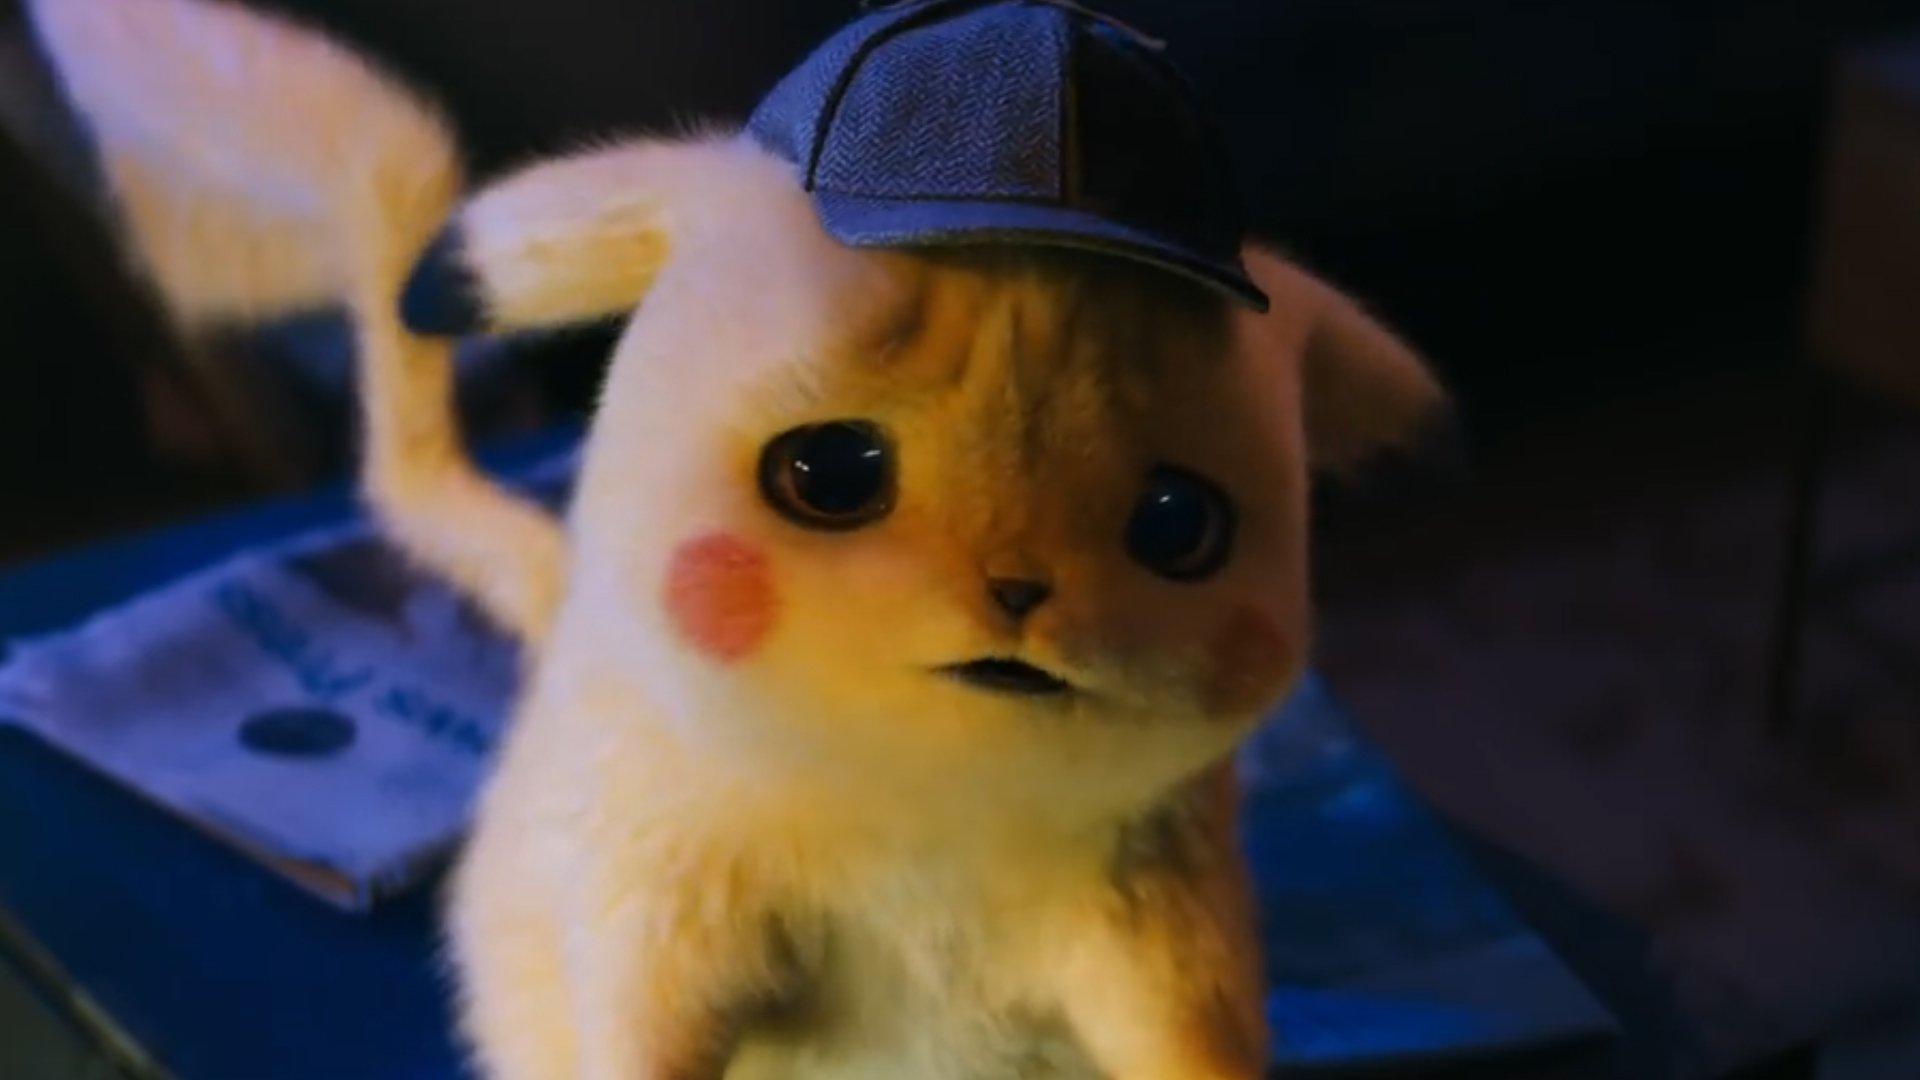 Ryan Reynolds as Detective Pikachu looking sad